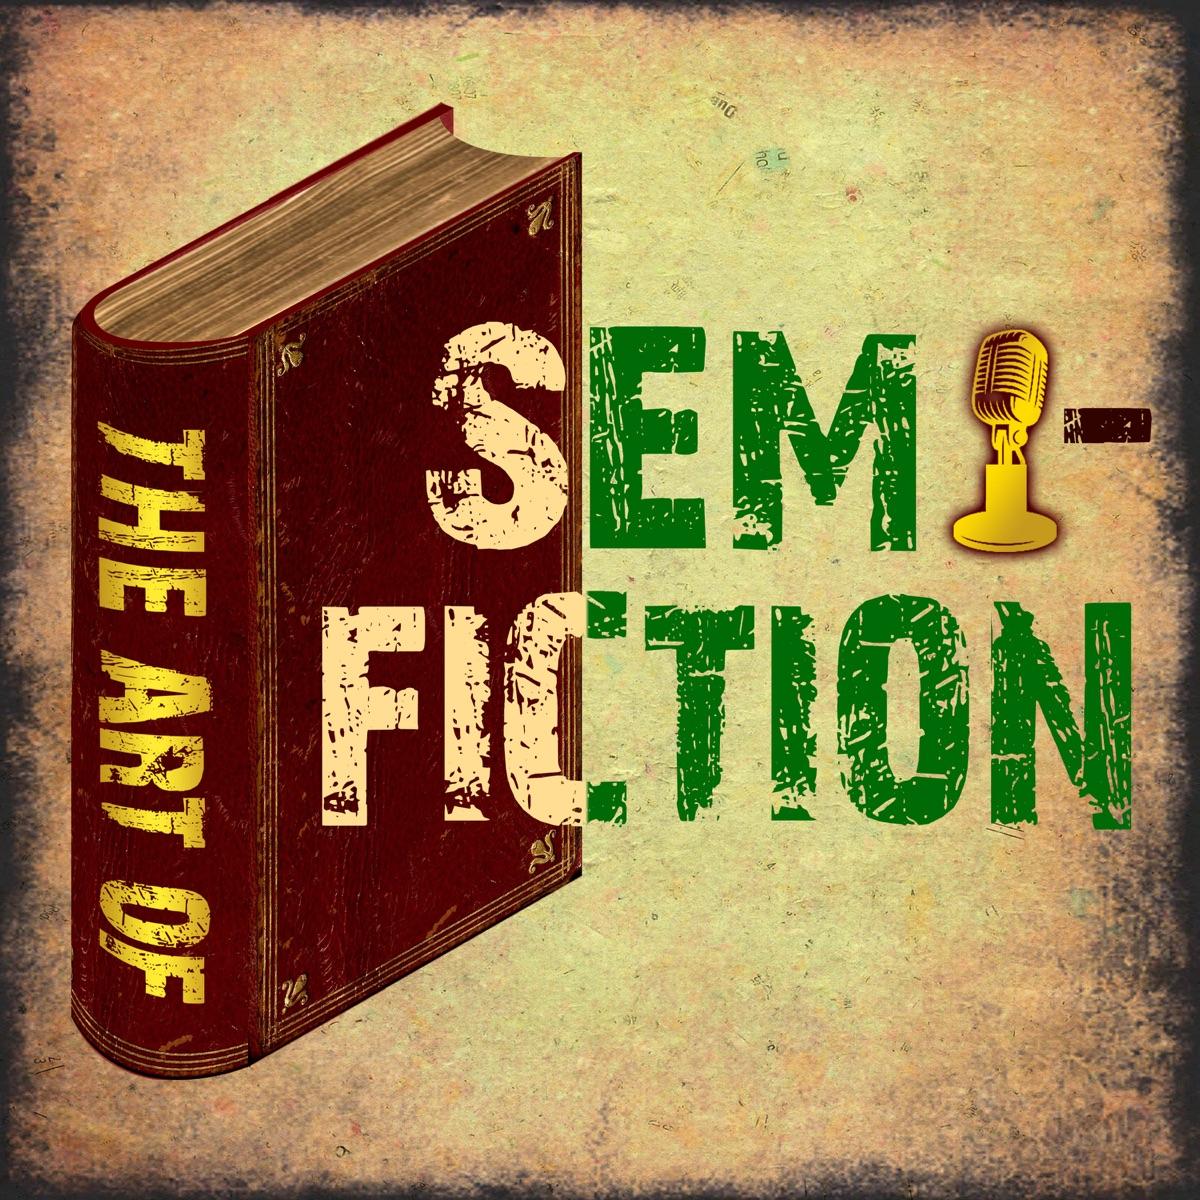 The Art of Semi-Fiction